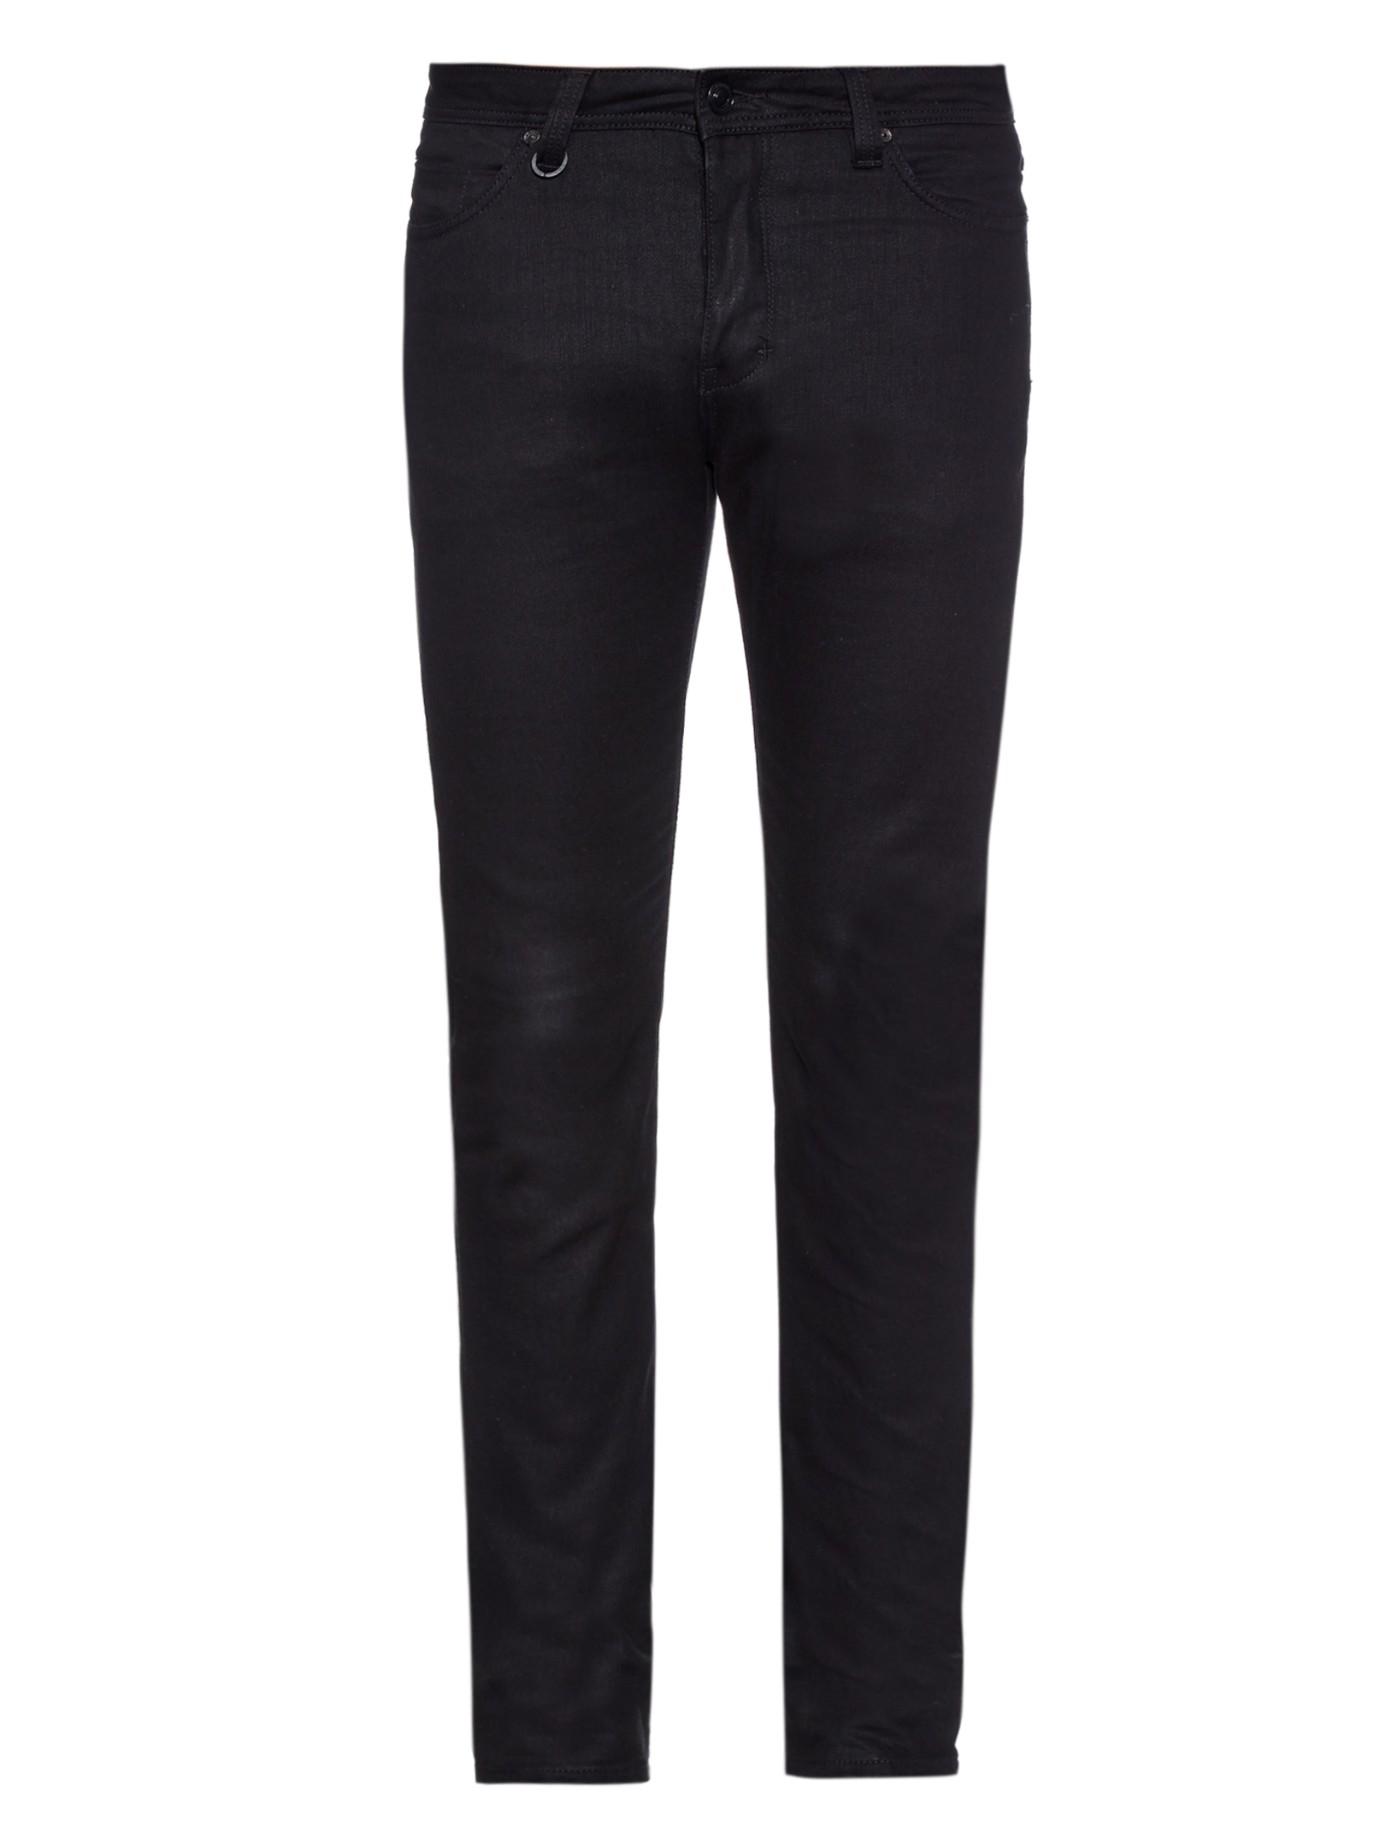 Neuw Iggy Skinny Jeans in Black for Men